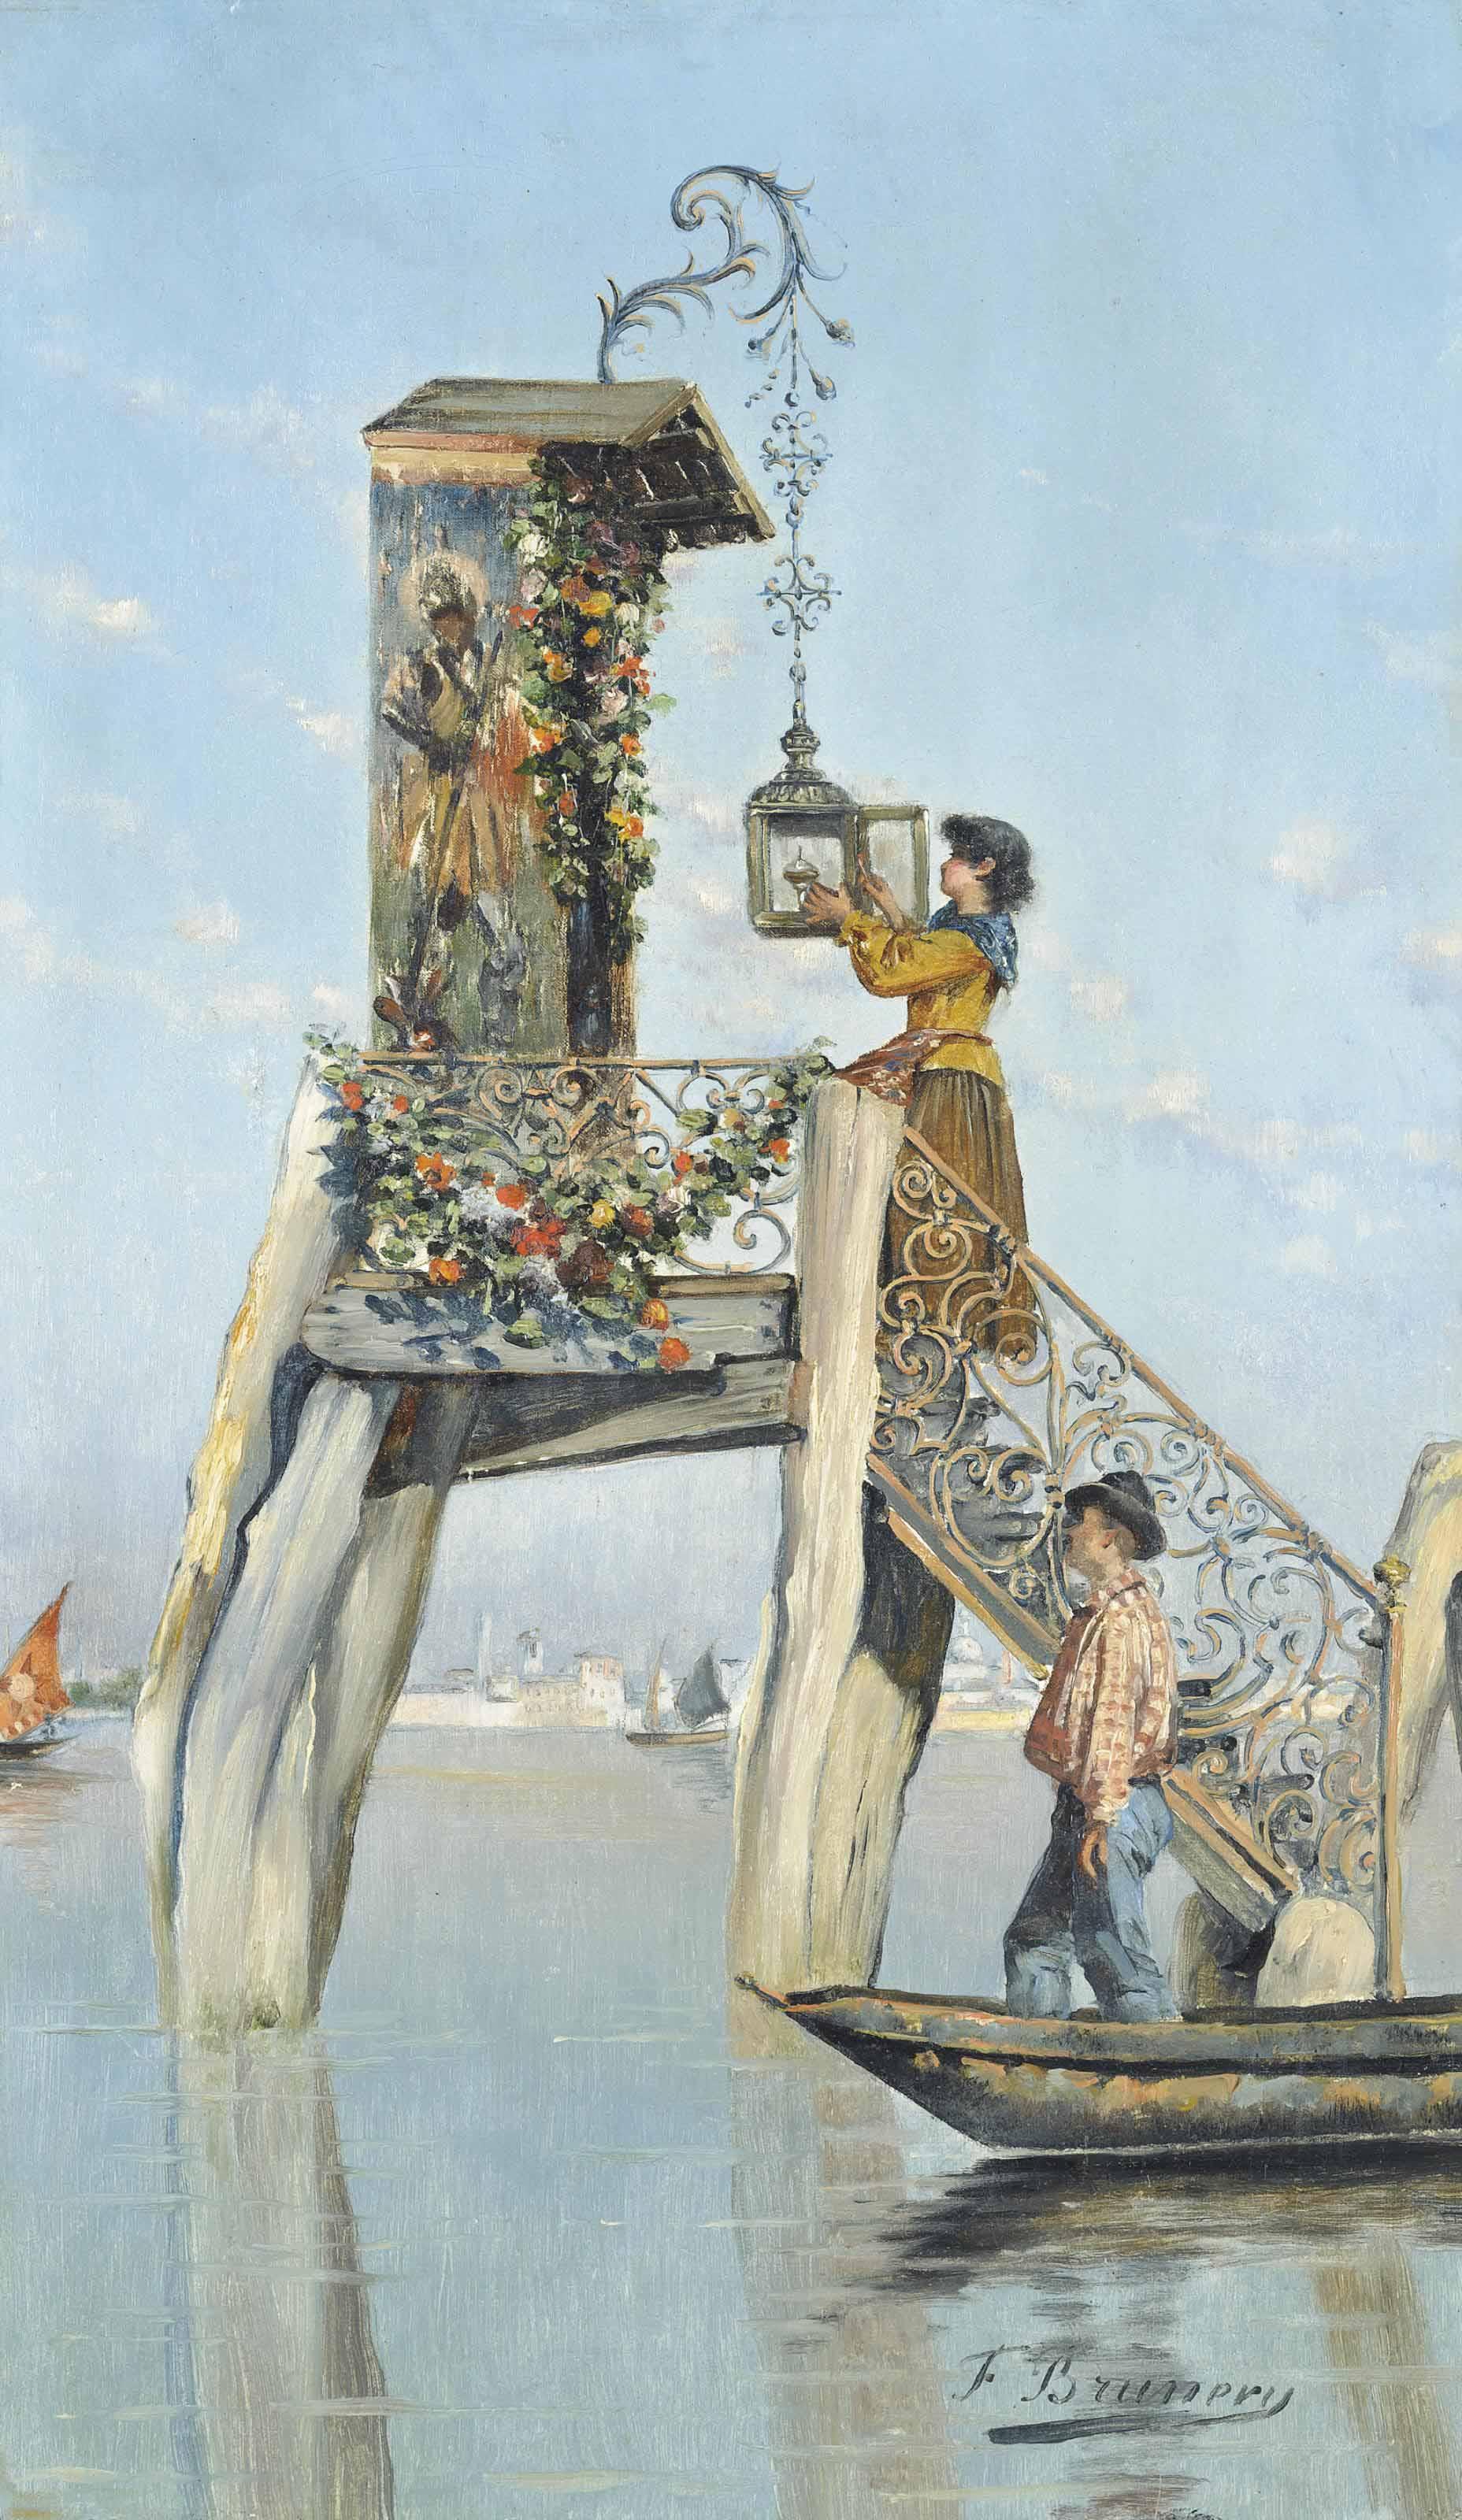 An offering on the Venetian lagoon